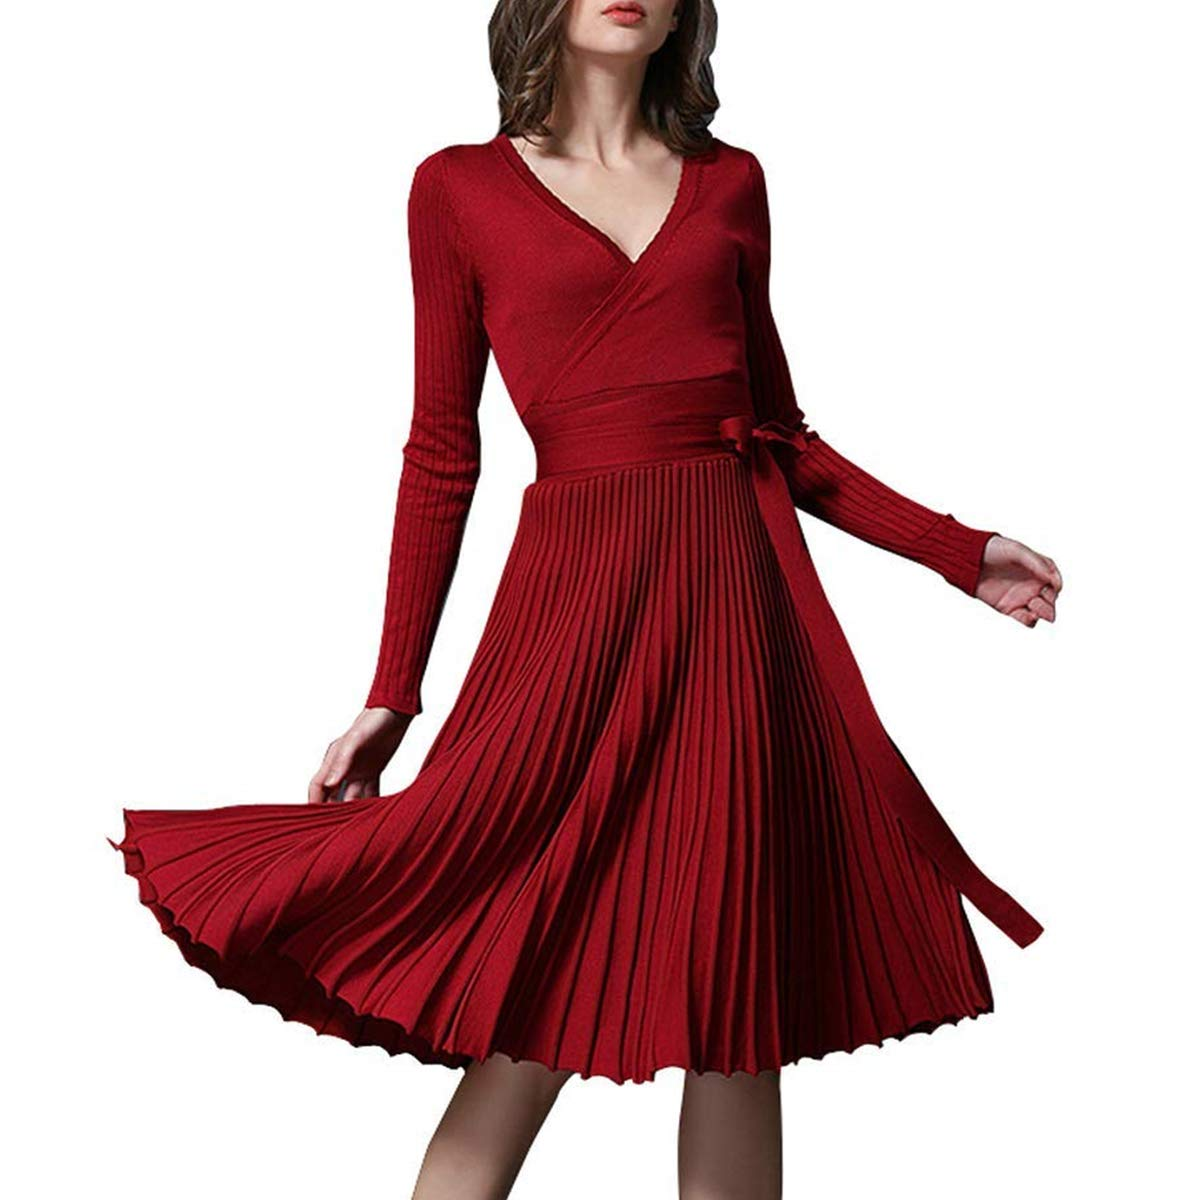 70eb789be81 Details. Midi Winter Dresses for Women Spring Pleated Knit Long Sleeve V  Neck Knee Length Surplice A-line Elegant Wrap Dress